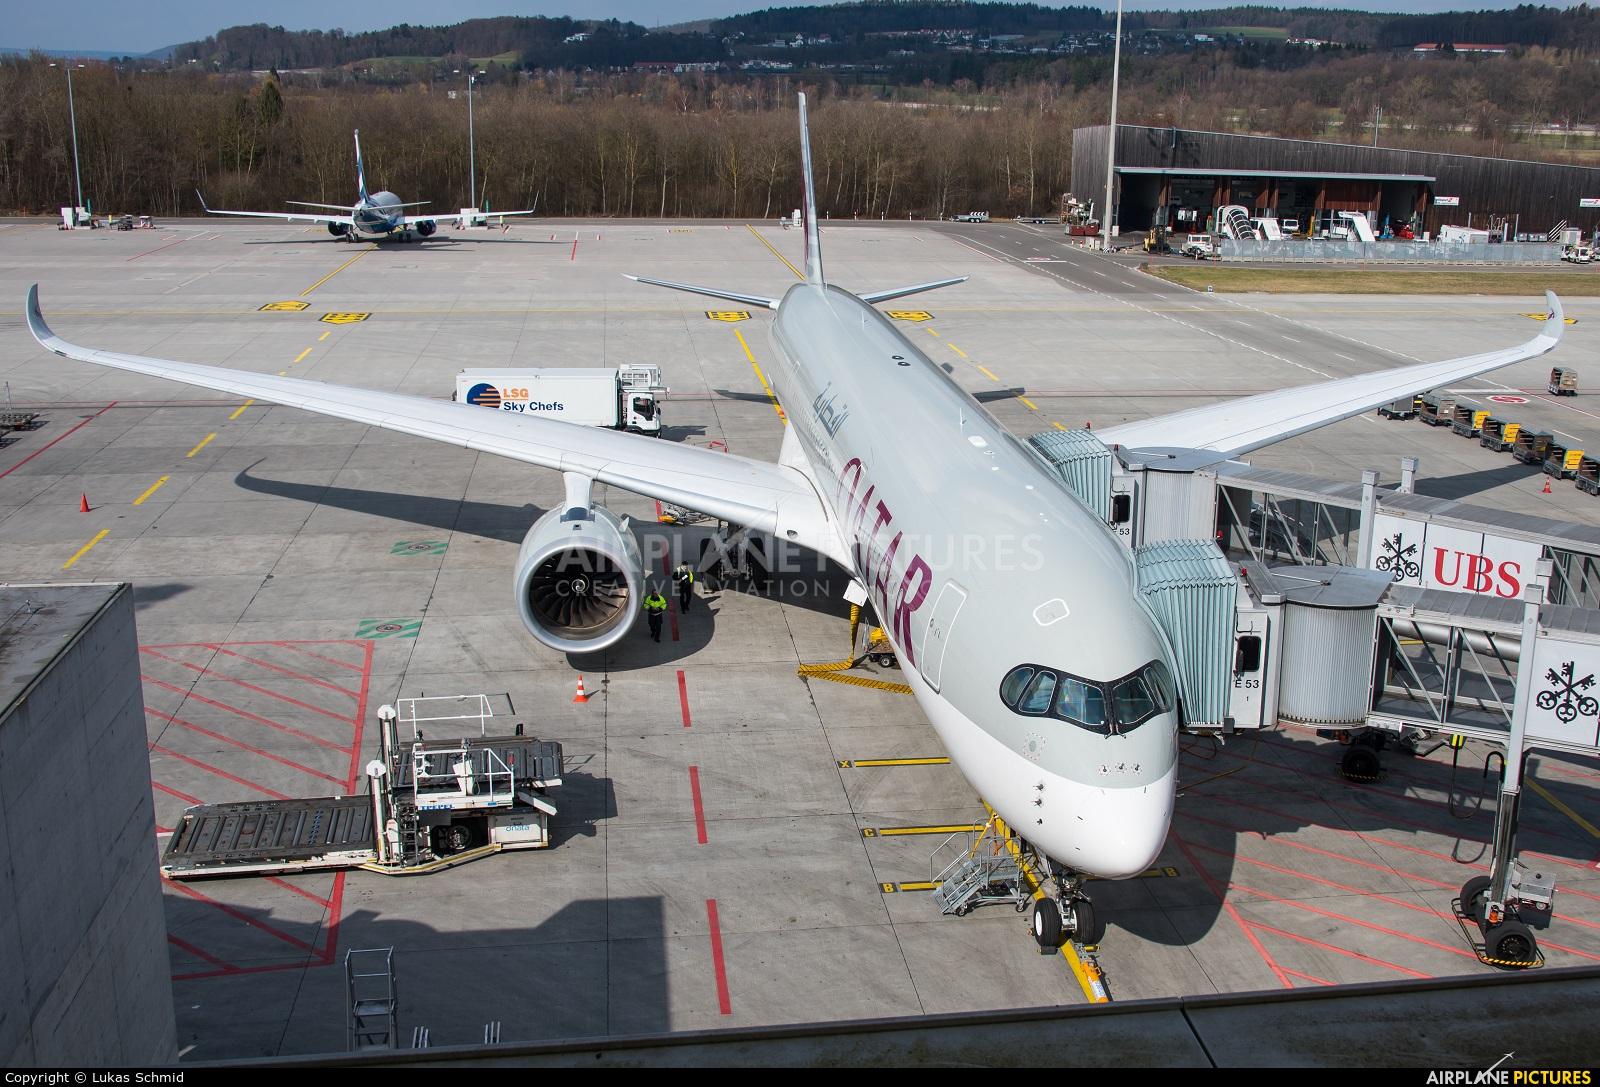 Qatar Airways A7-ALC aircraft at Zurich